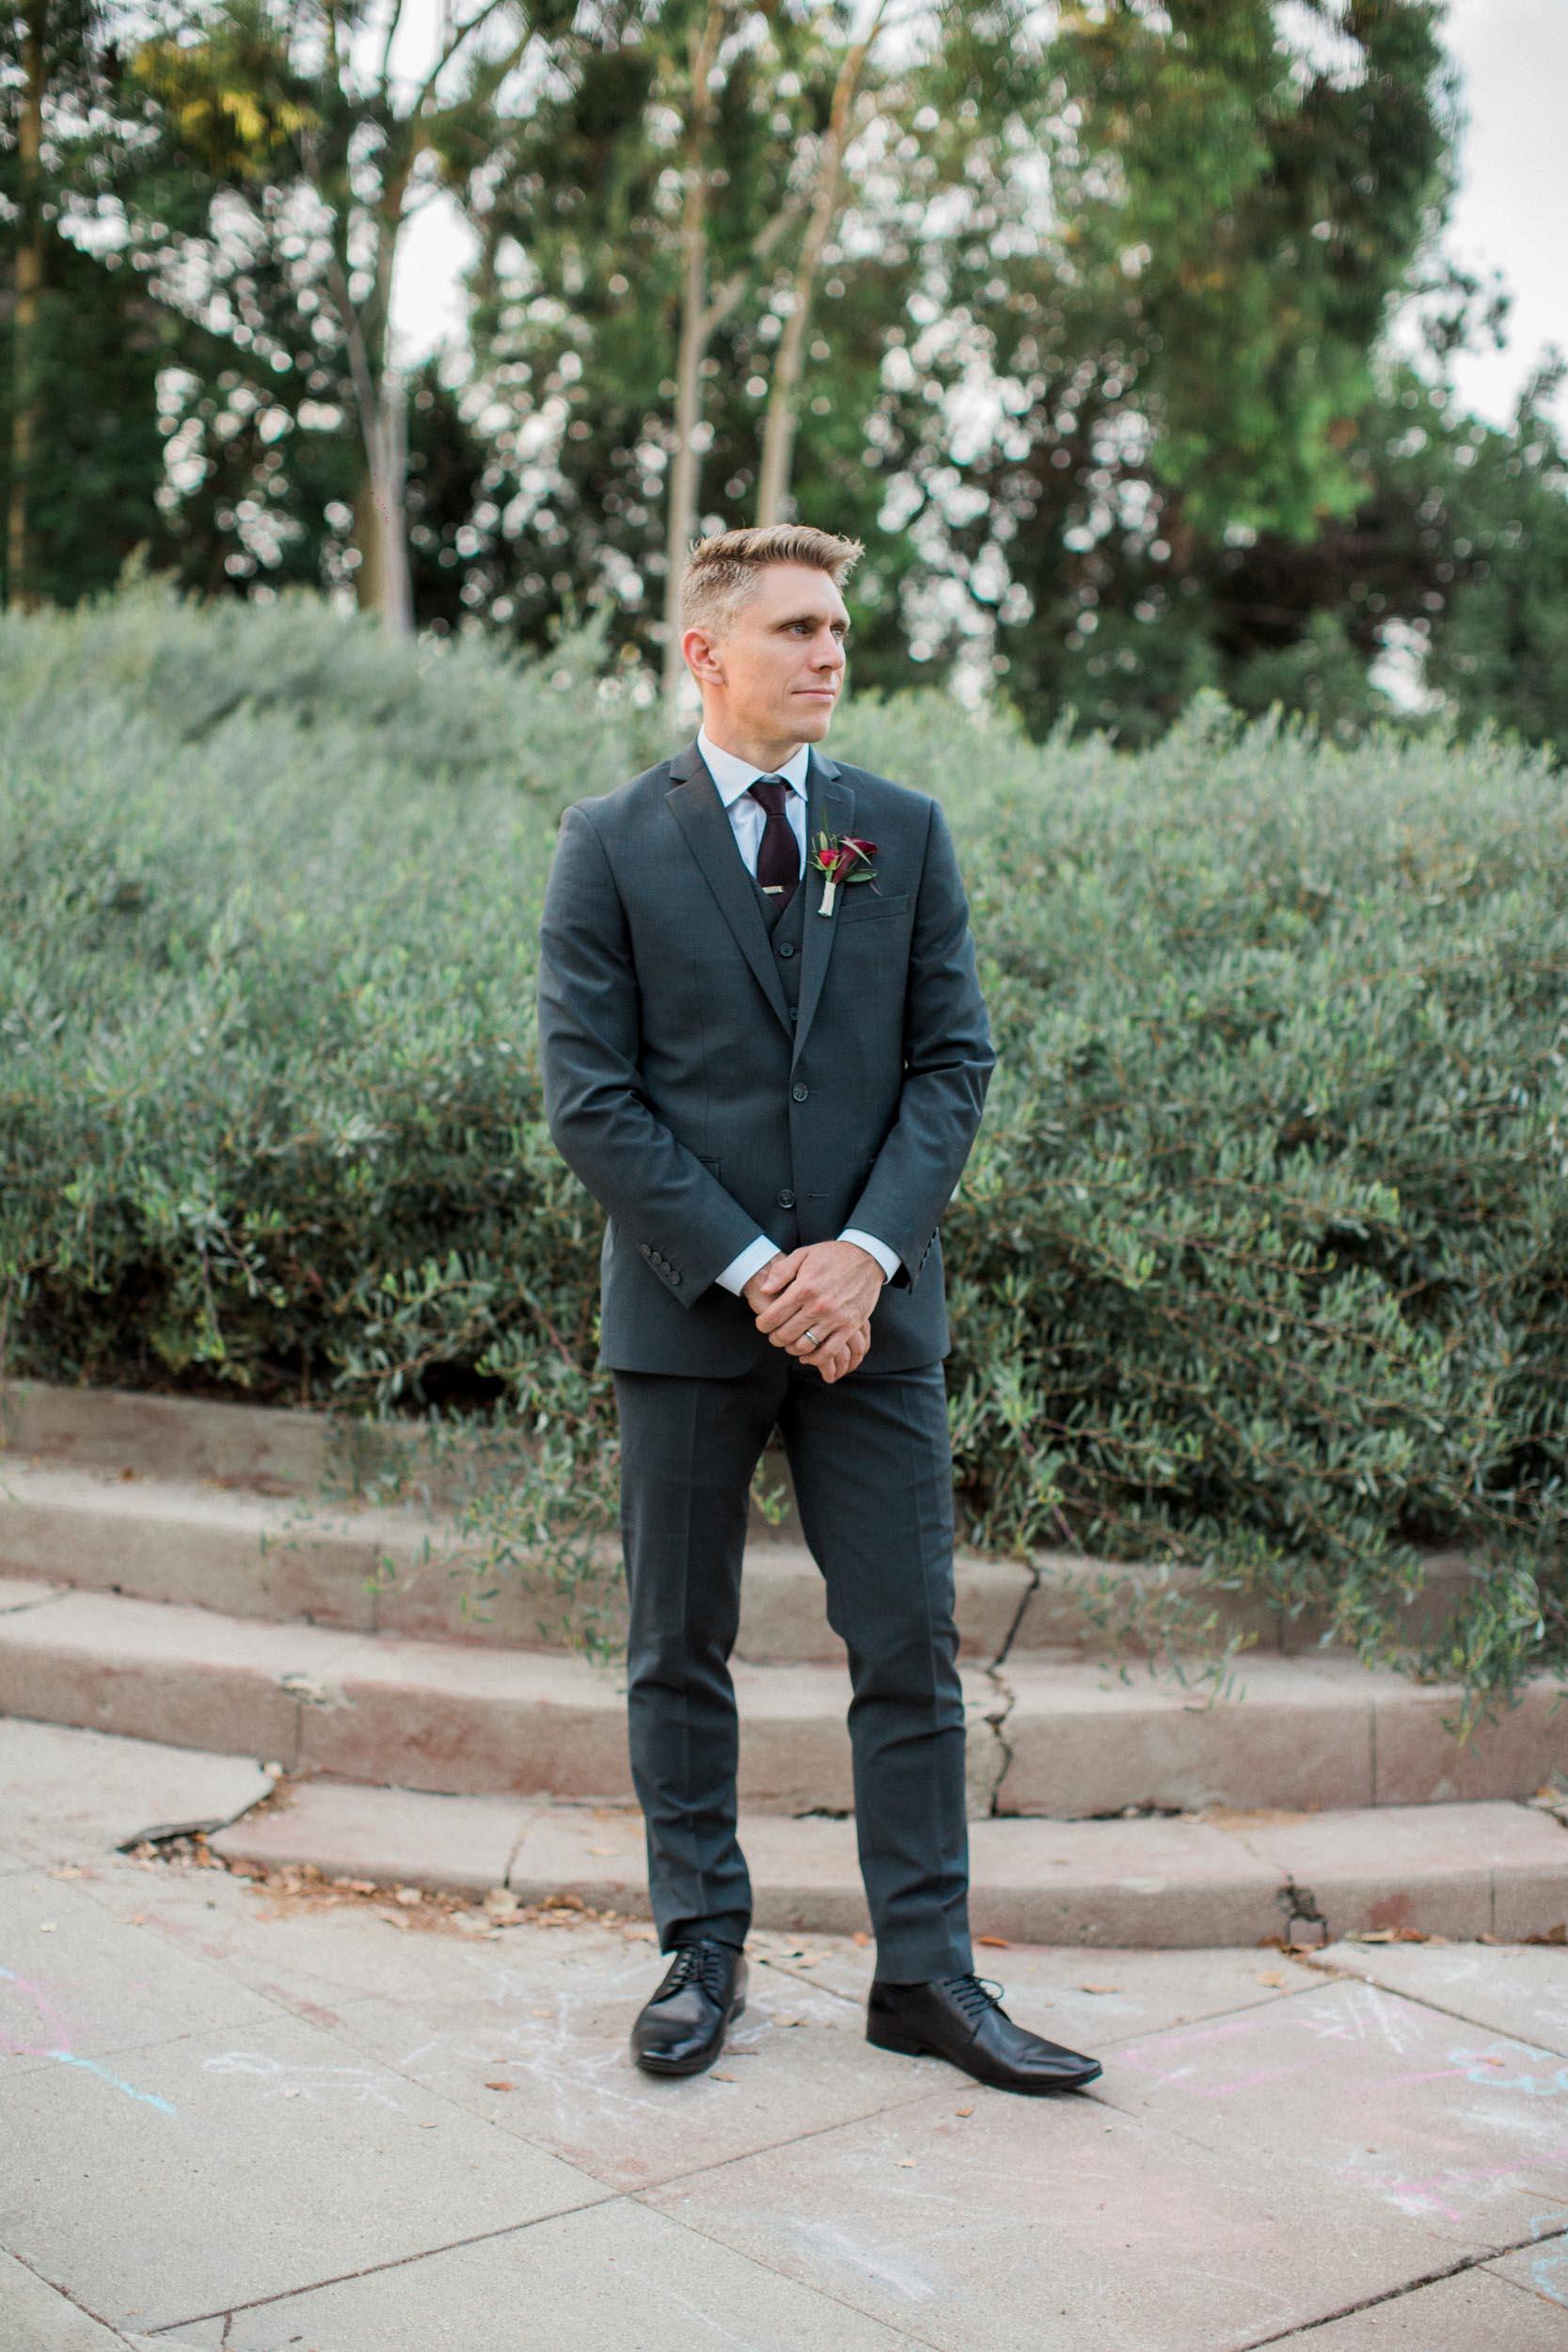 BKM-Photography-Highland-Park-Los-Angeles-Backyard-Wedding-0048.jpg